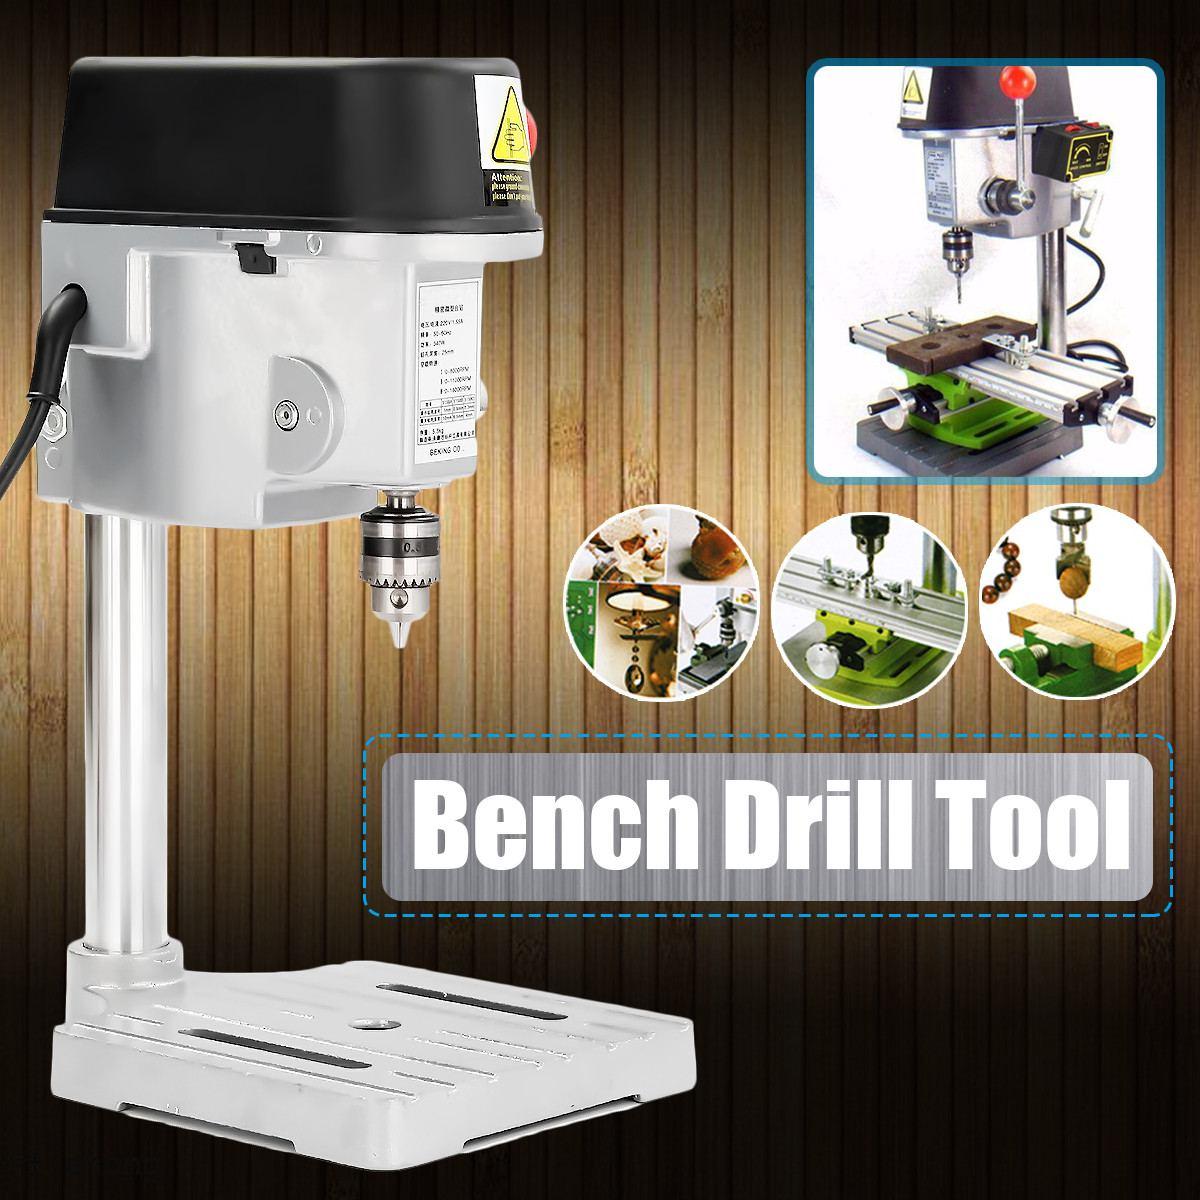 Perforadora Mini perforadora de 240W para máquina de Banco de perforación de brocas de Metal de madera de 0,6-6,5mm herramientas eléctricas